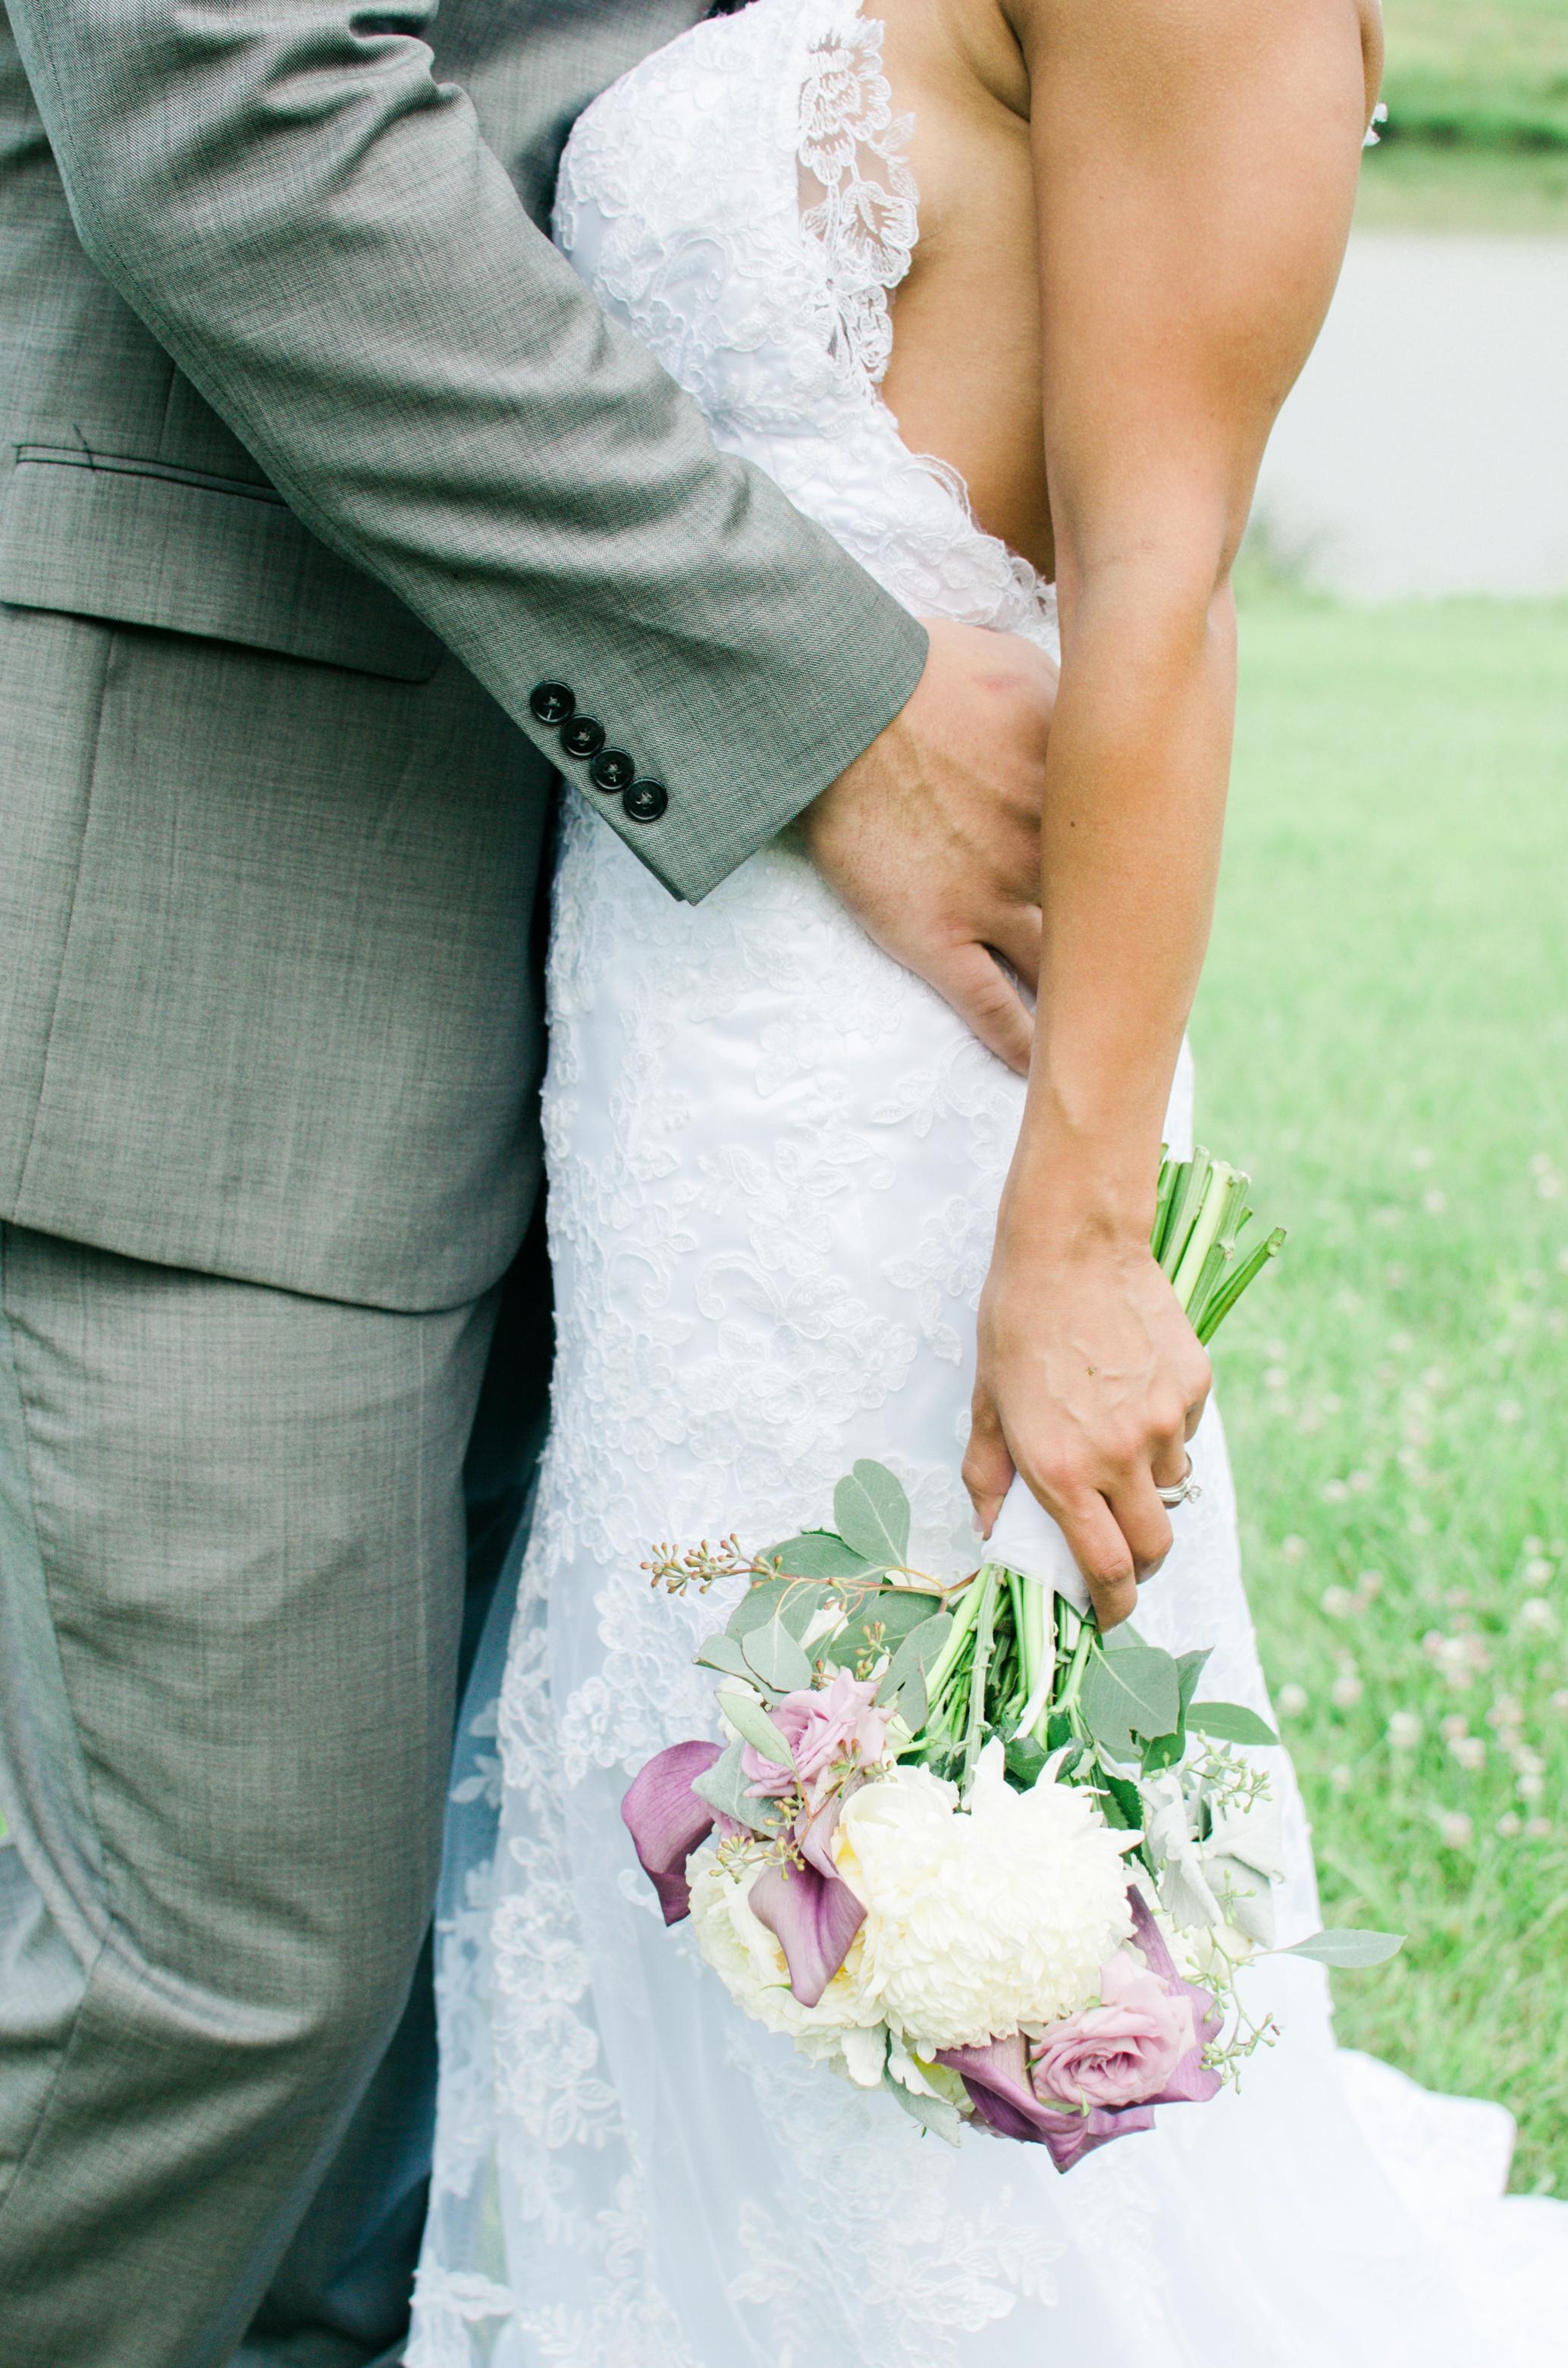 Barnes' Place Rustic Outdoor Wedding | Ali Leigh Photo Minneapolis Wedding Photographer_0151.jpg